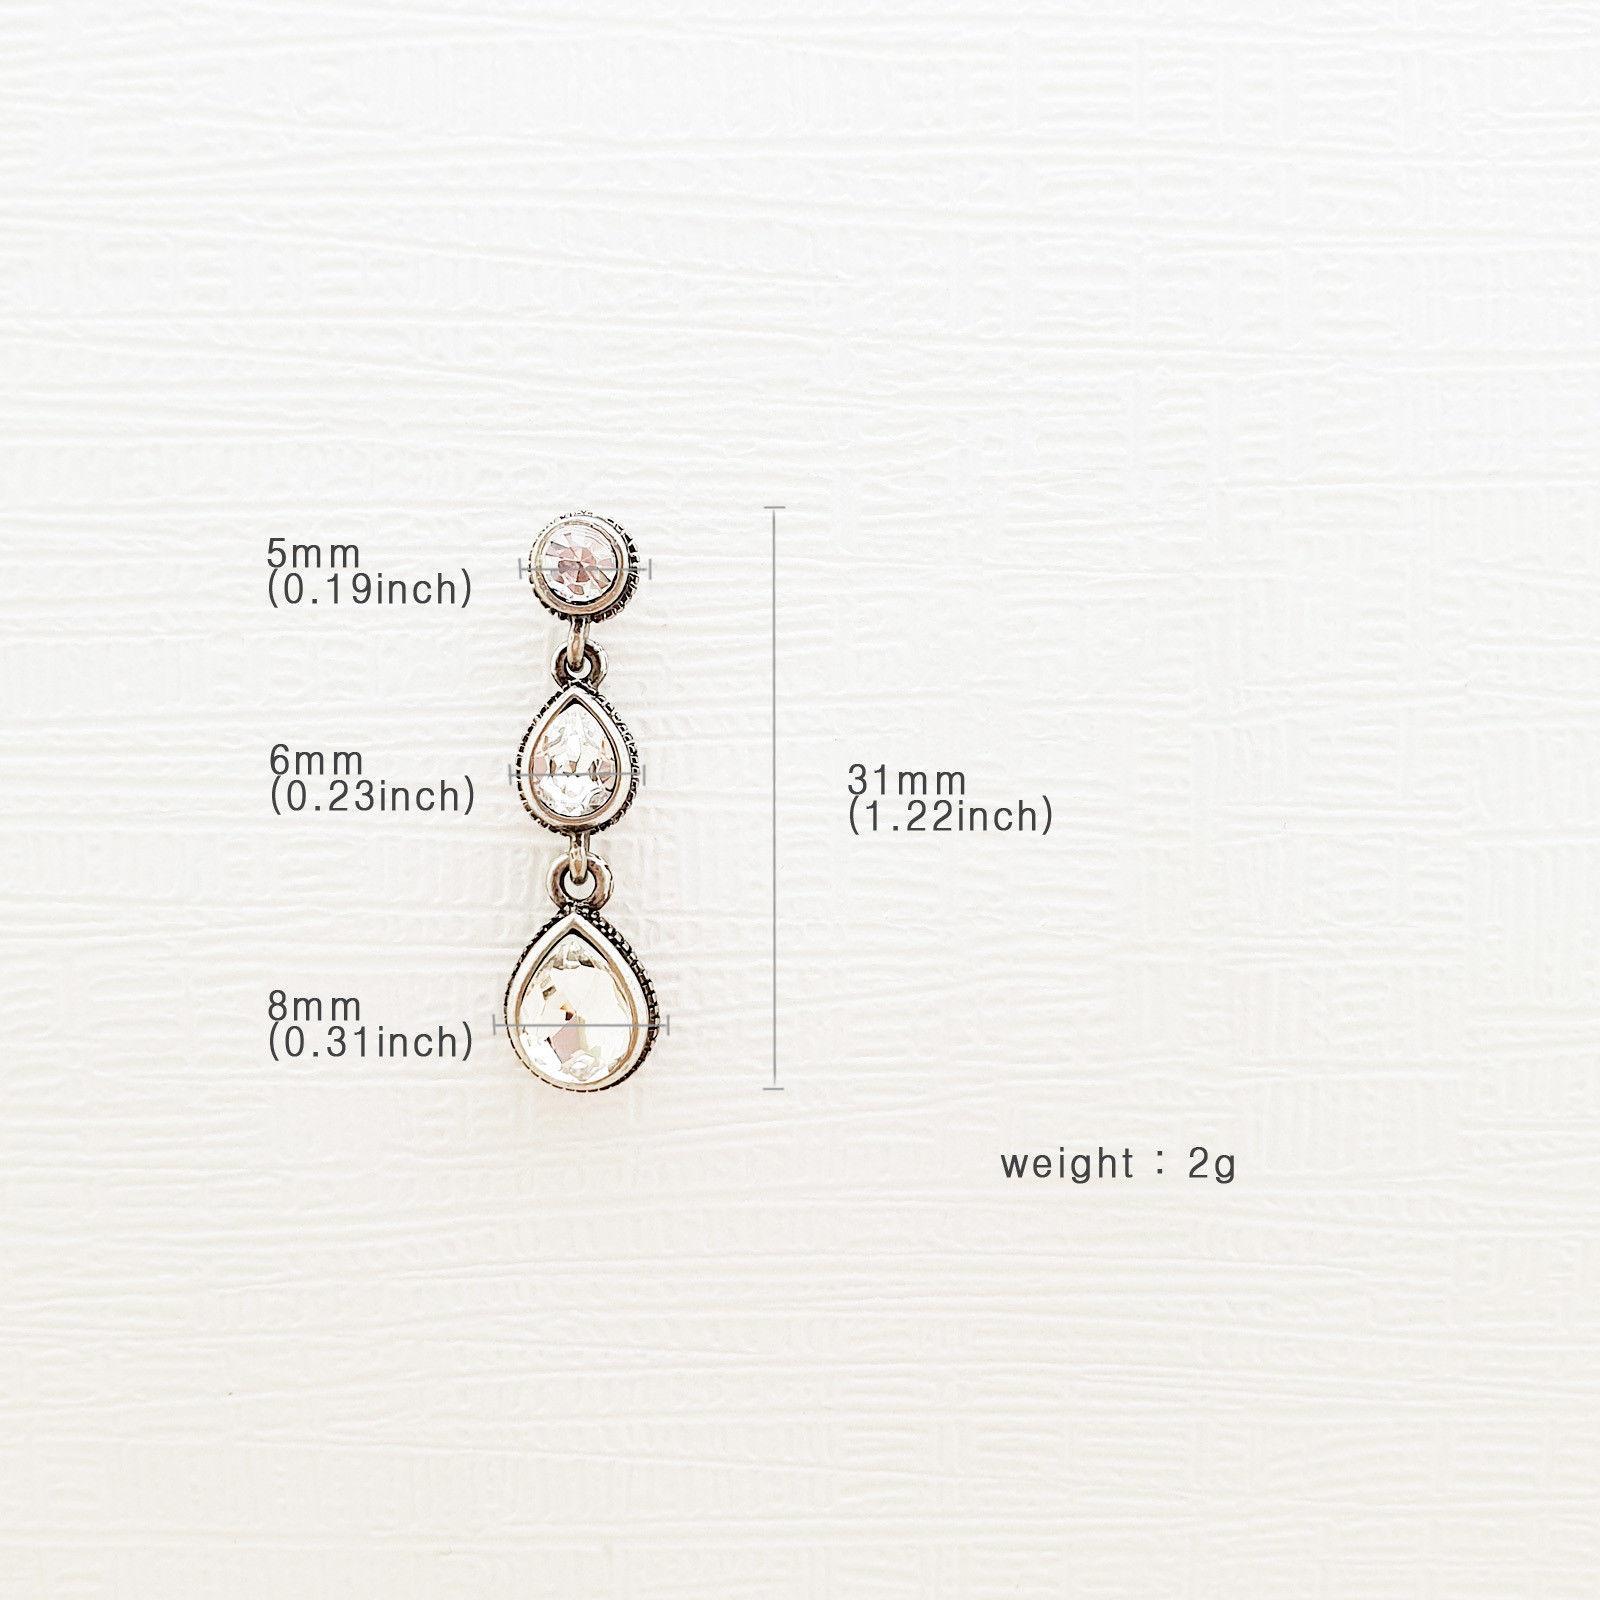 Tiered Round Water Drop Teardrop Shape Made With Swarovski Stone Dangle Earrings image 10